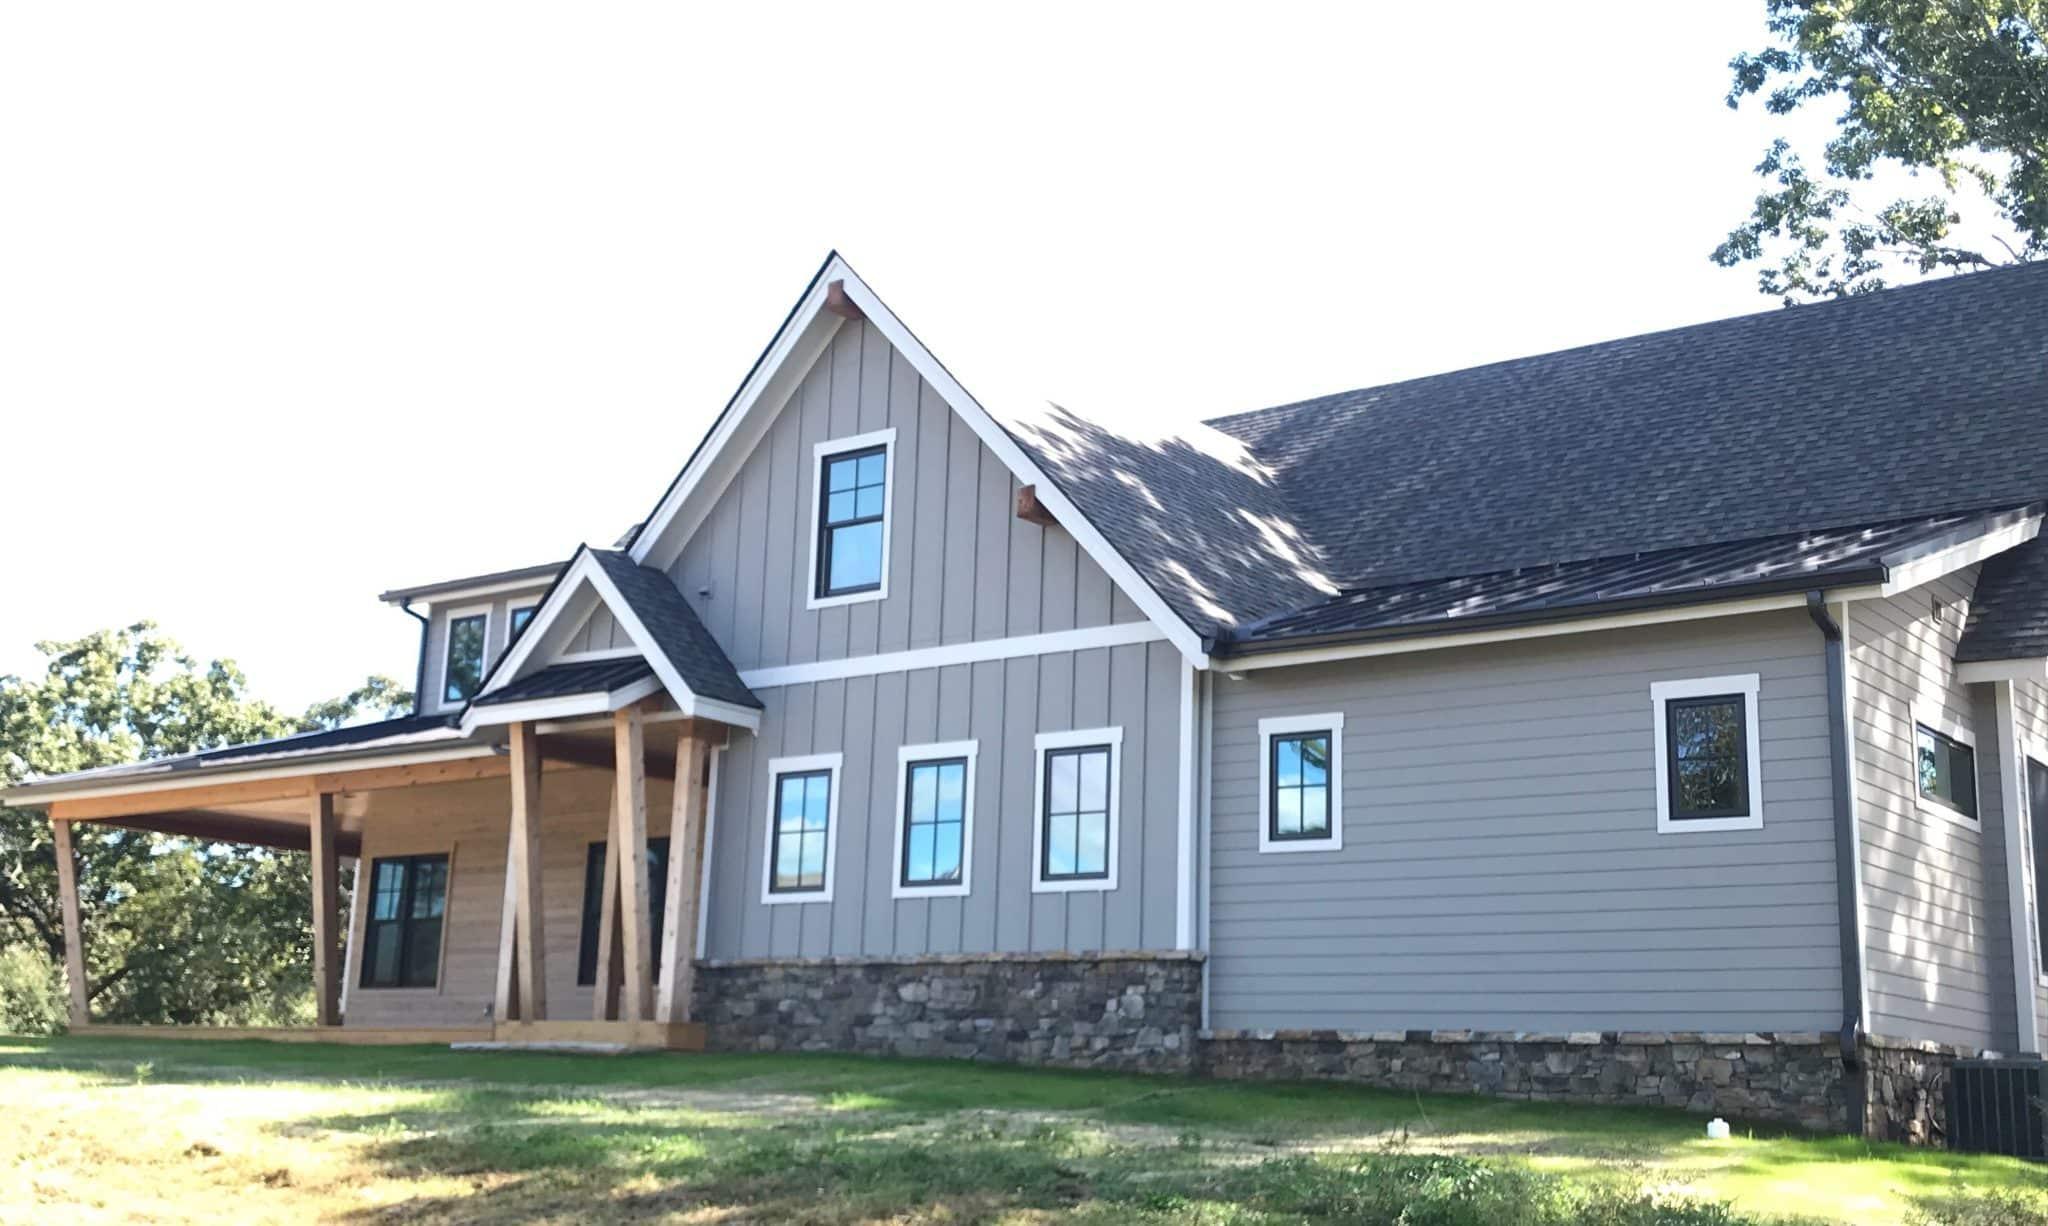 WILDBERRY MODERN RANCH FARMHOUSE HOUSE PLANS